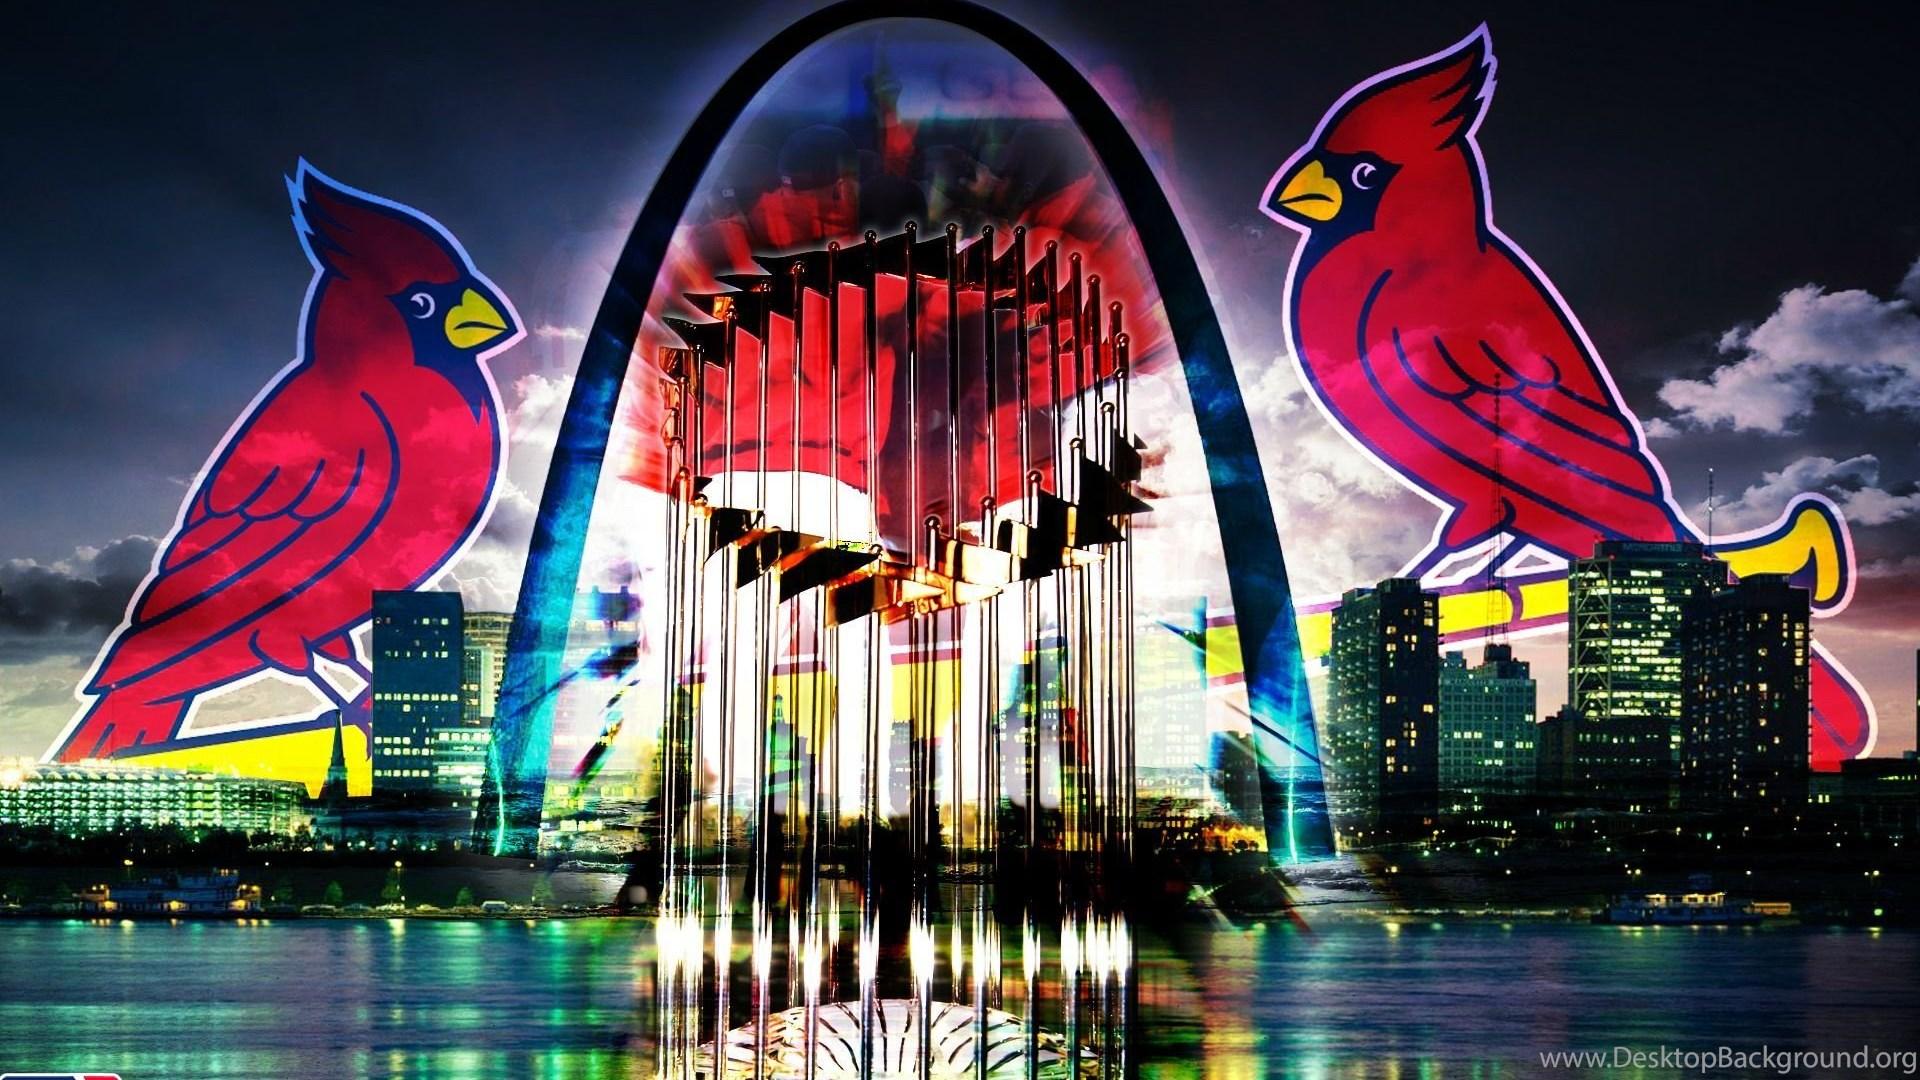 St Louis Cardinals Wallpaper Images Photos Desktop Background